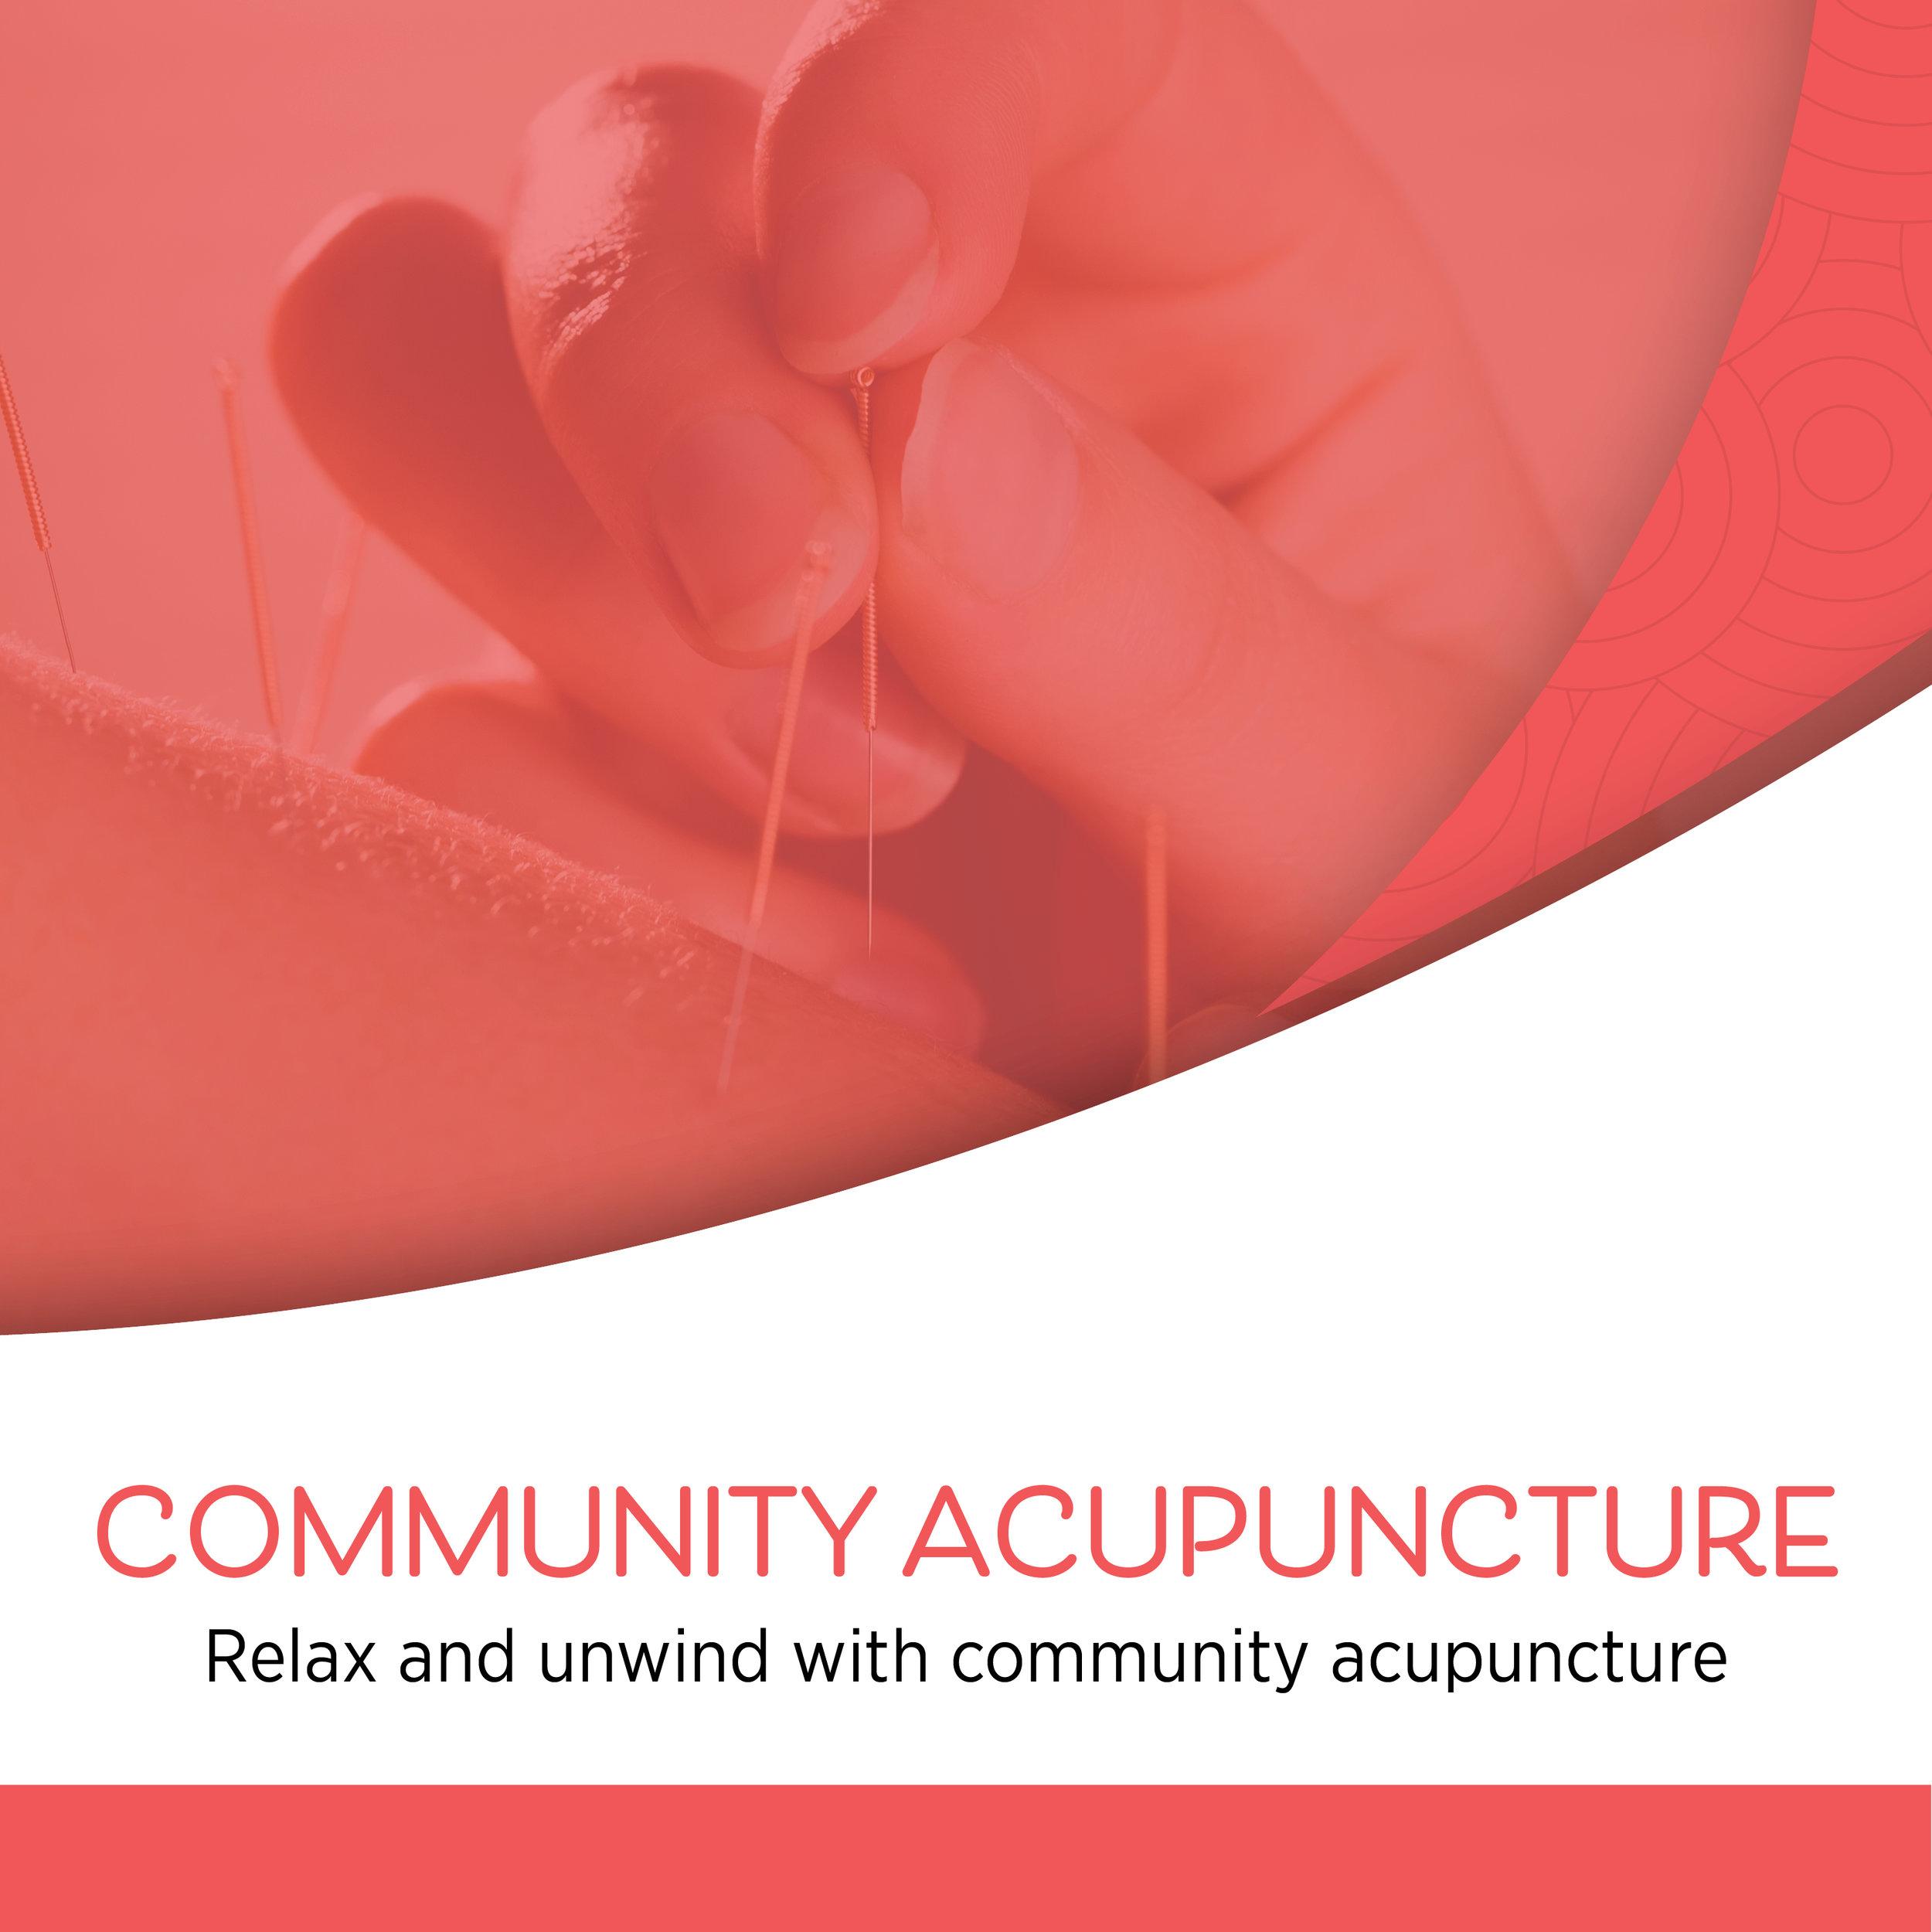 Haumea_2019_Event_Community Acupuncture_Web.jpg